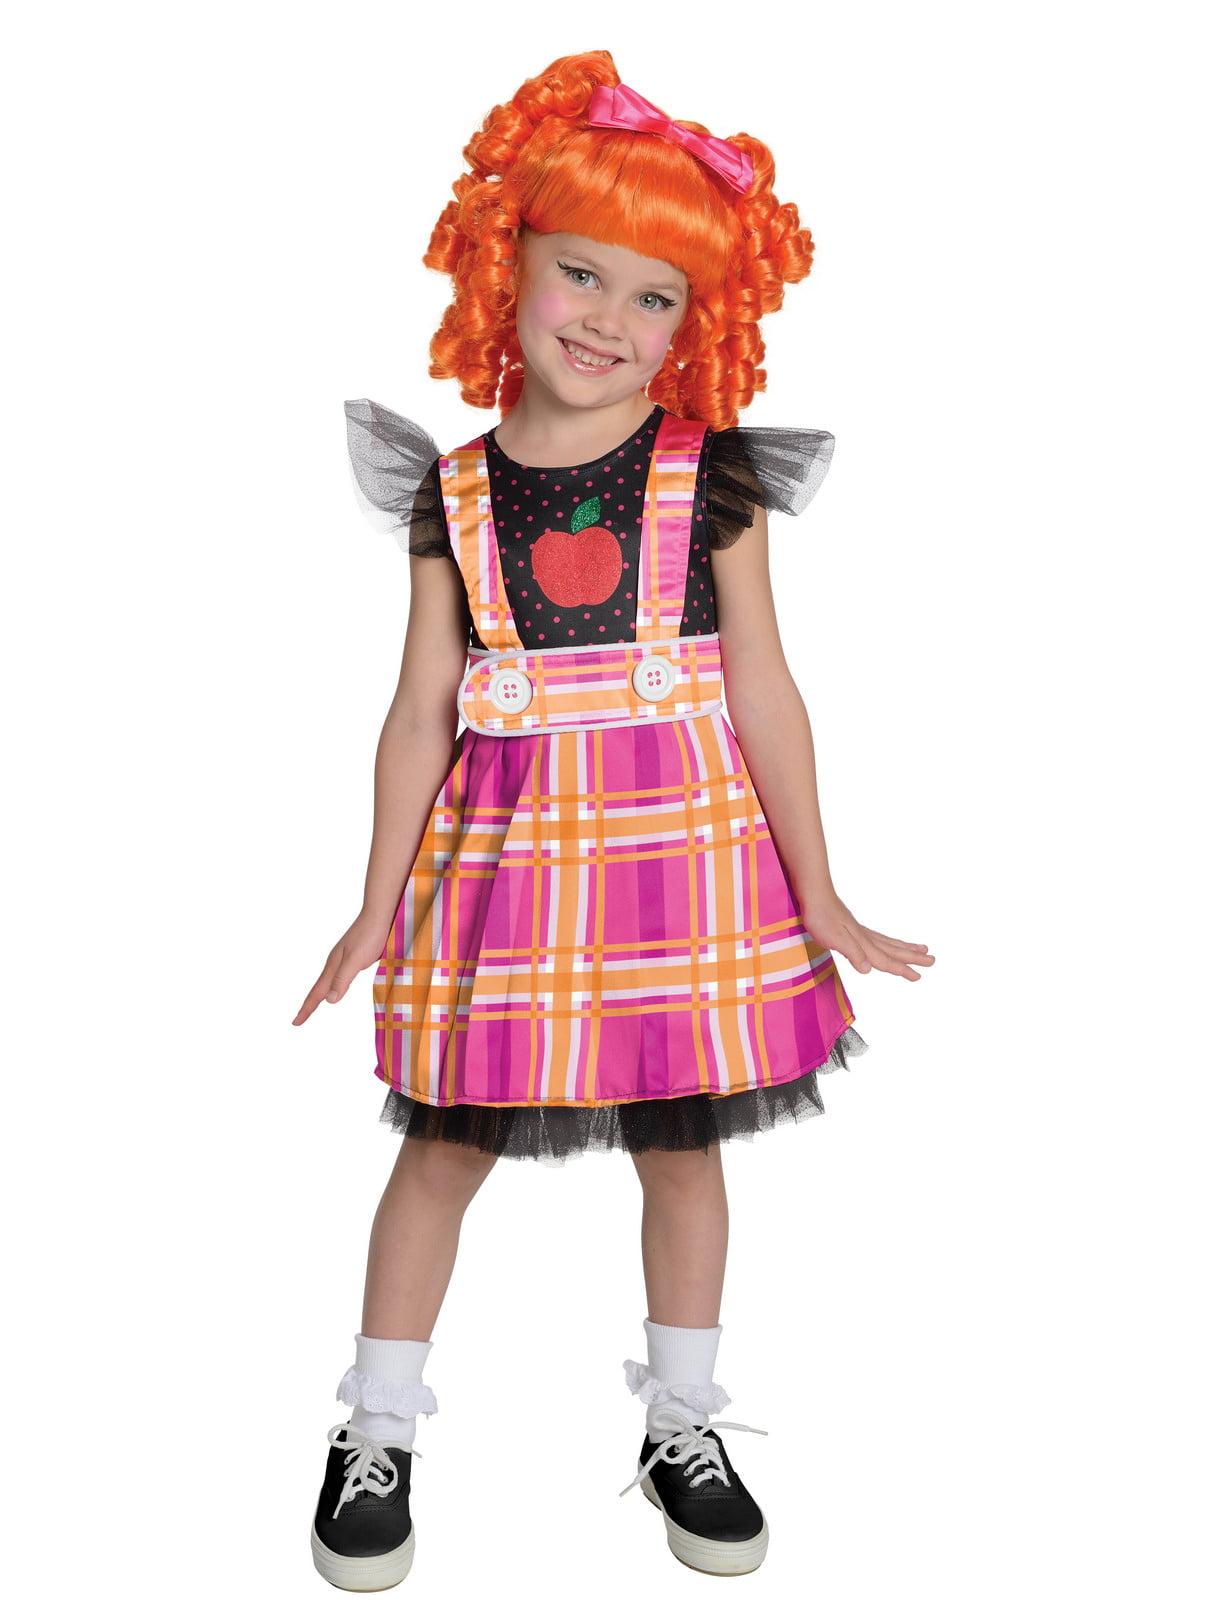 Spot Splatter Splash Lalaloopsy Artist Fancy Dress Up Halloween Child Costume